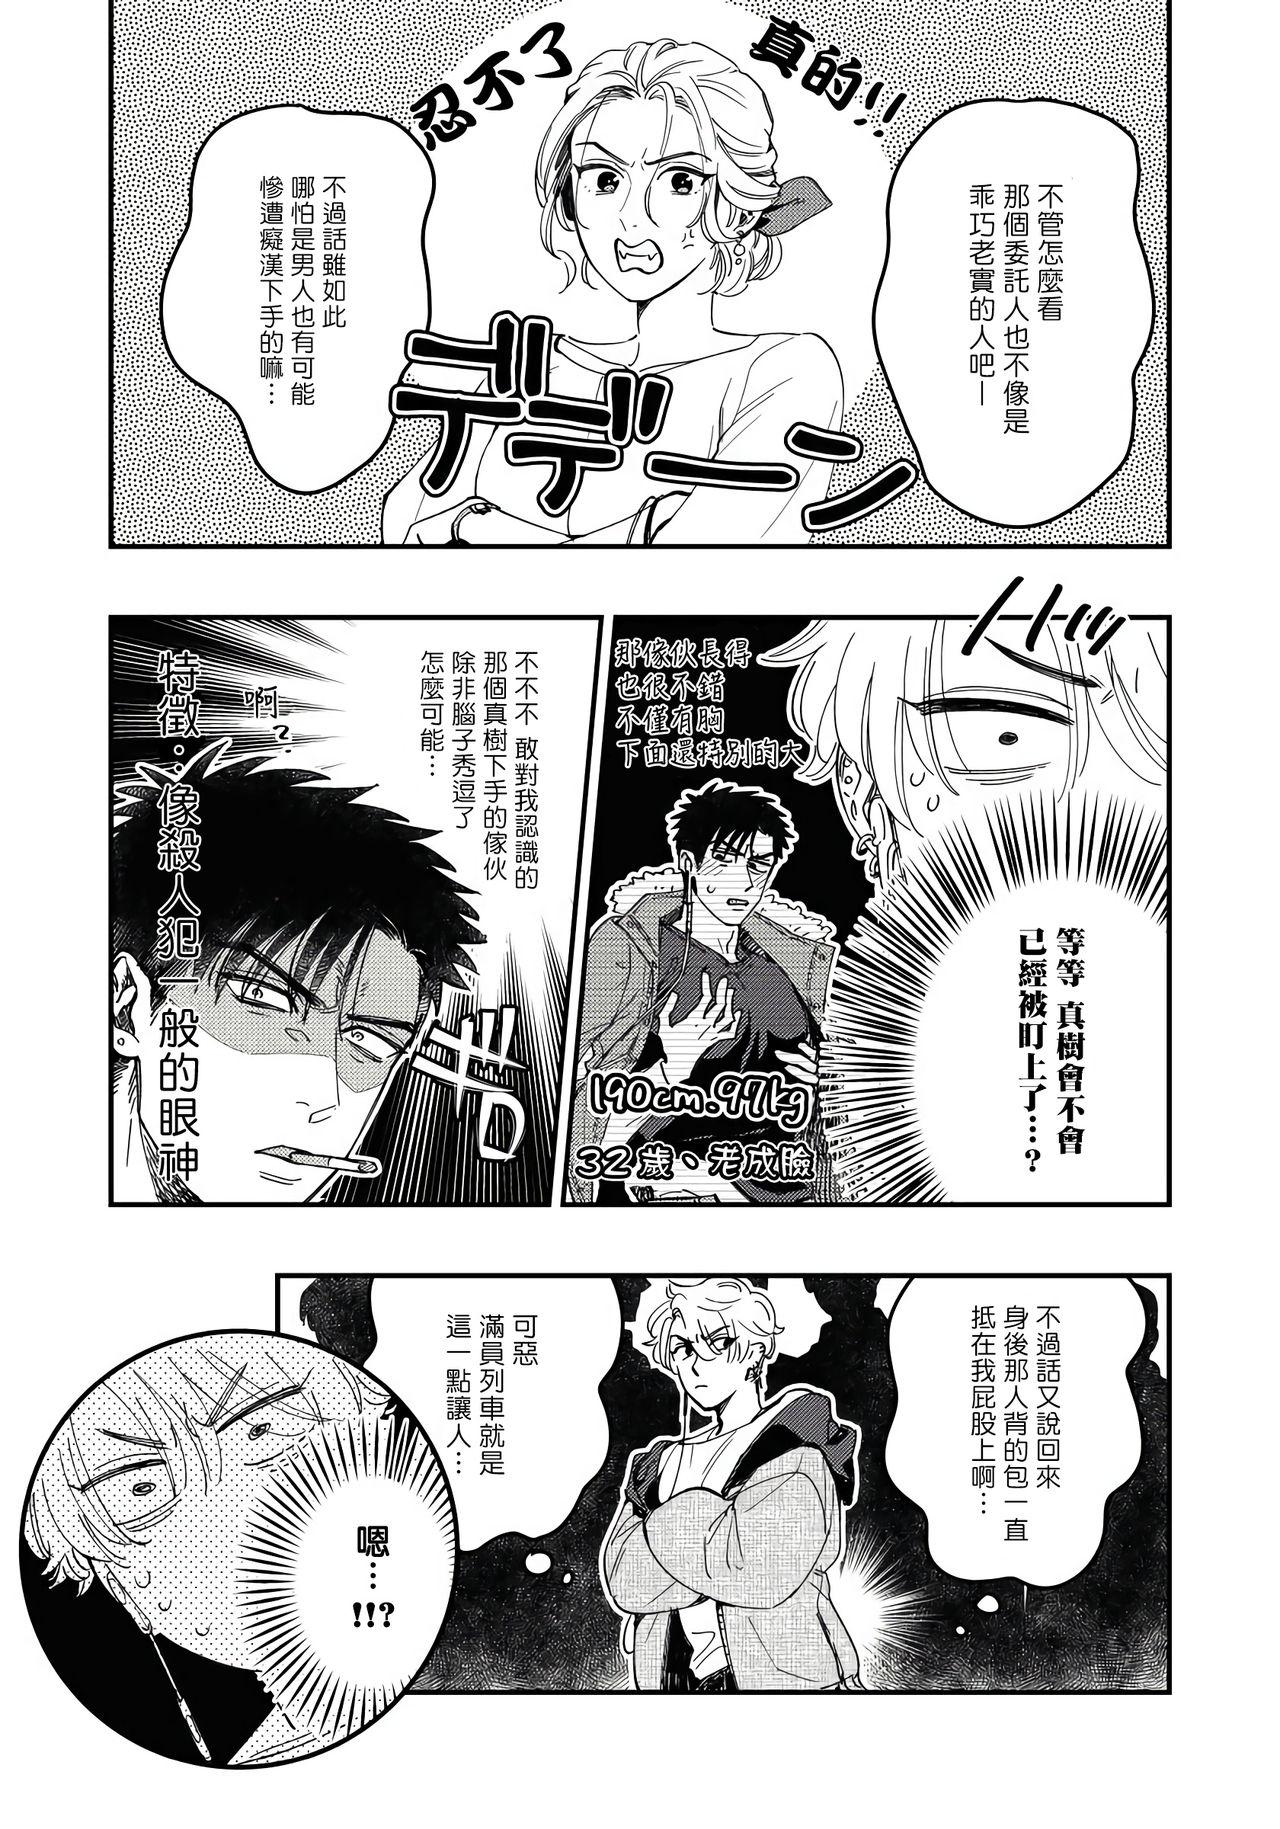 Kokomade Yarutoha Kiitenai! |之前可没听说要做到这个份上啊! 1-3 10